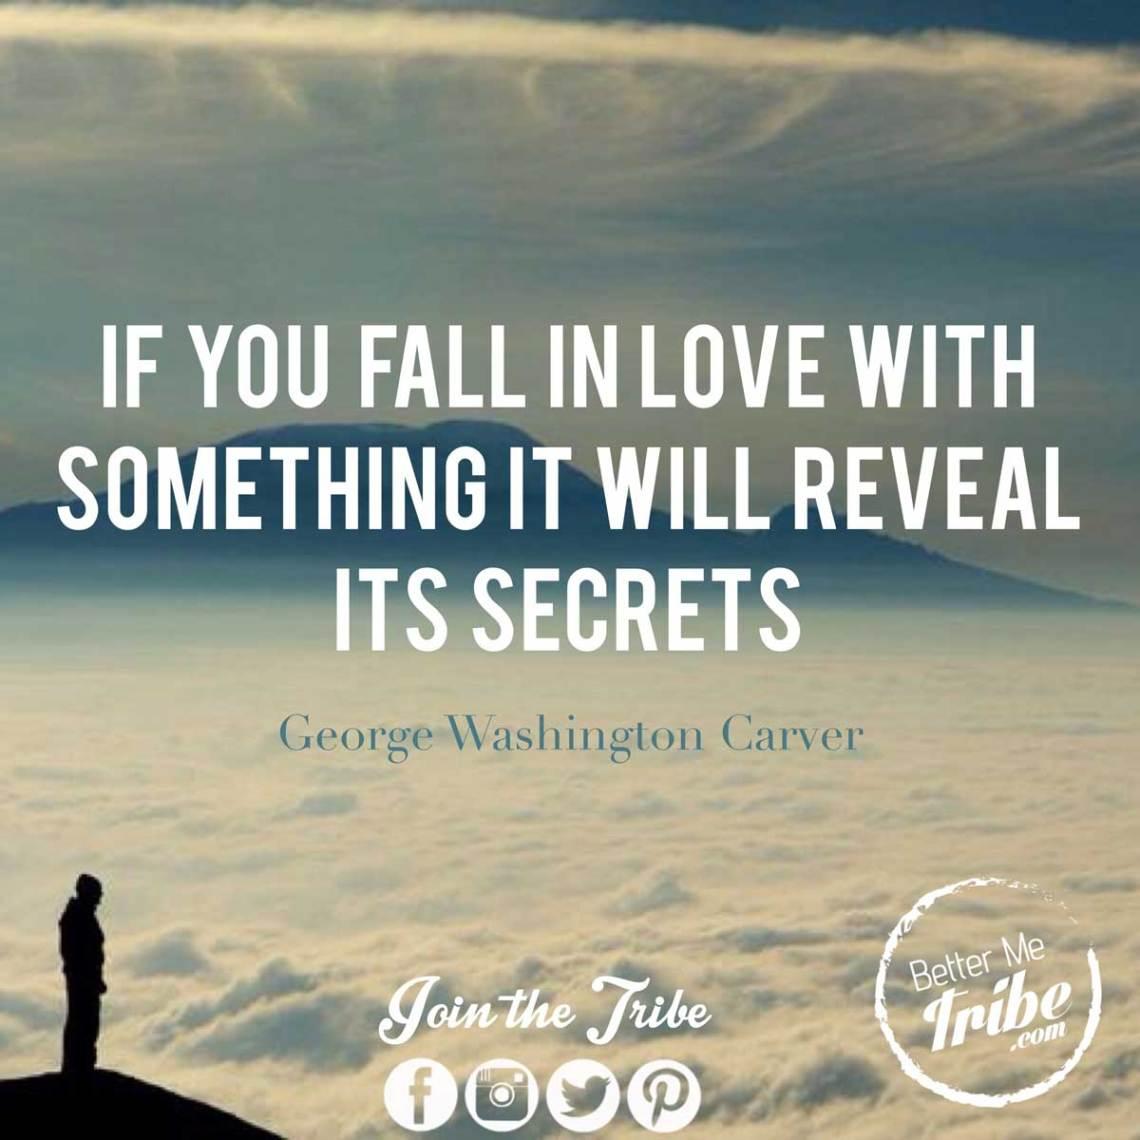 FallinLove-secrets-web